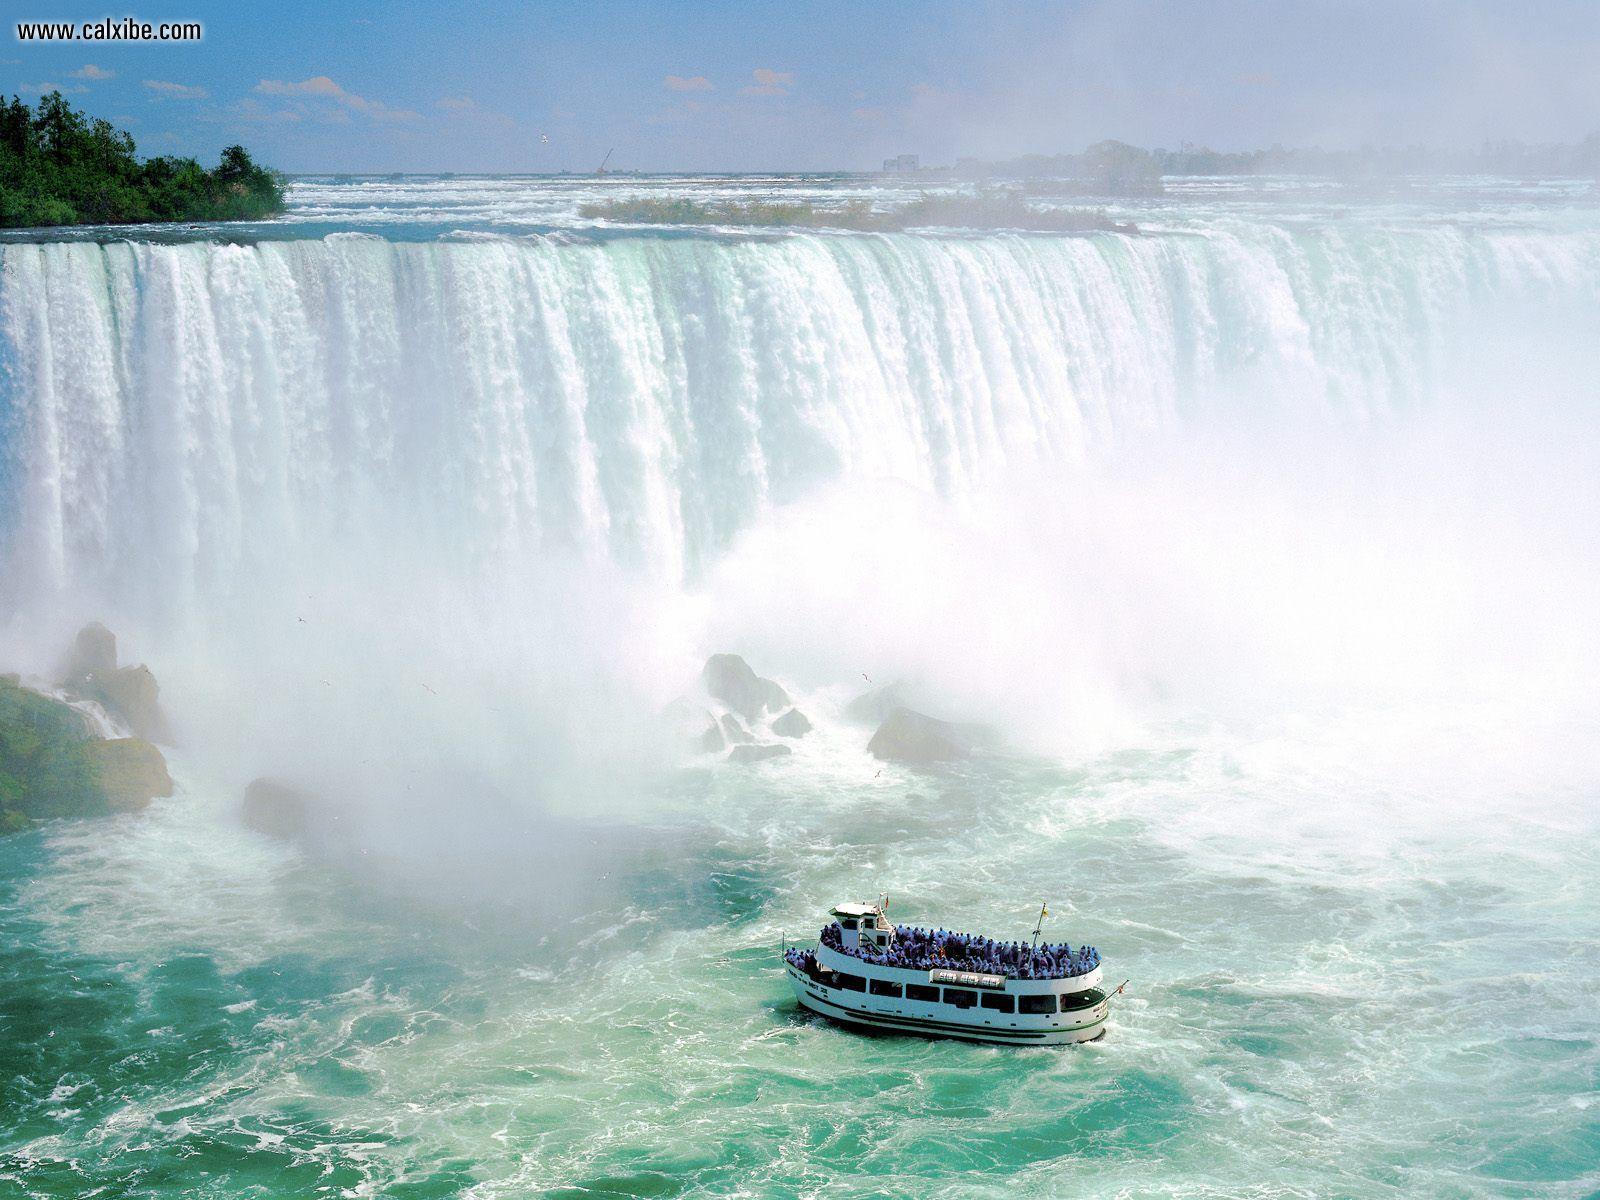 Discount Wallpaper In Ontario Canada 1600x1200